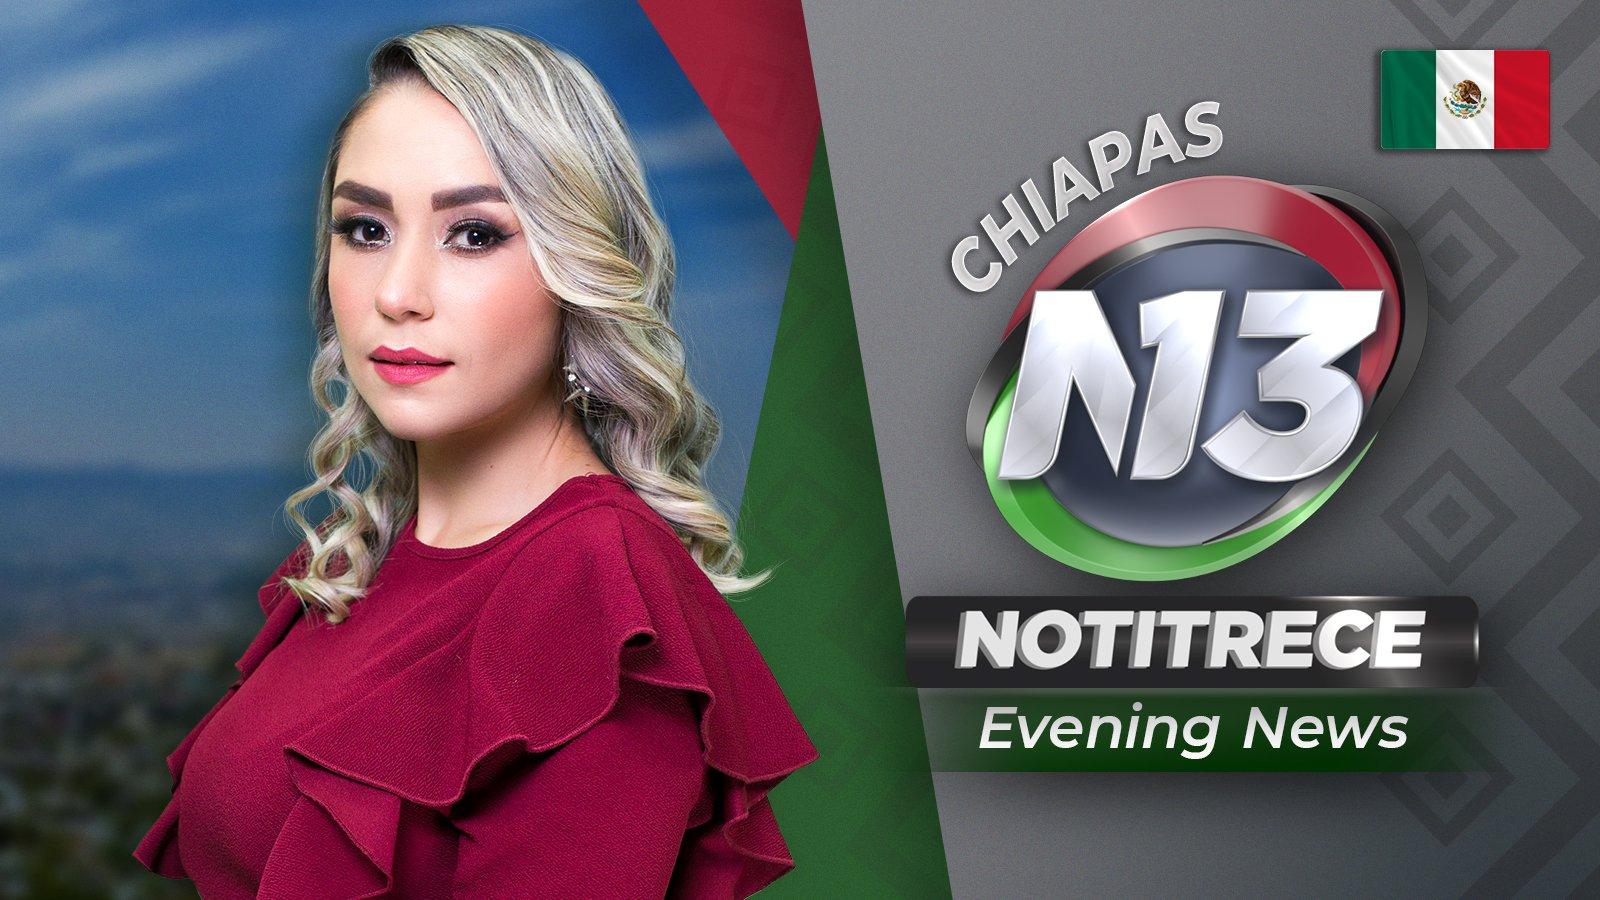 Evening Noti13 Chiapas poster